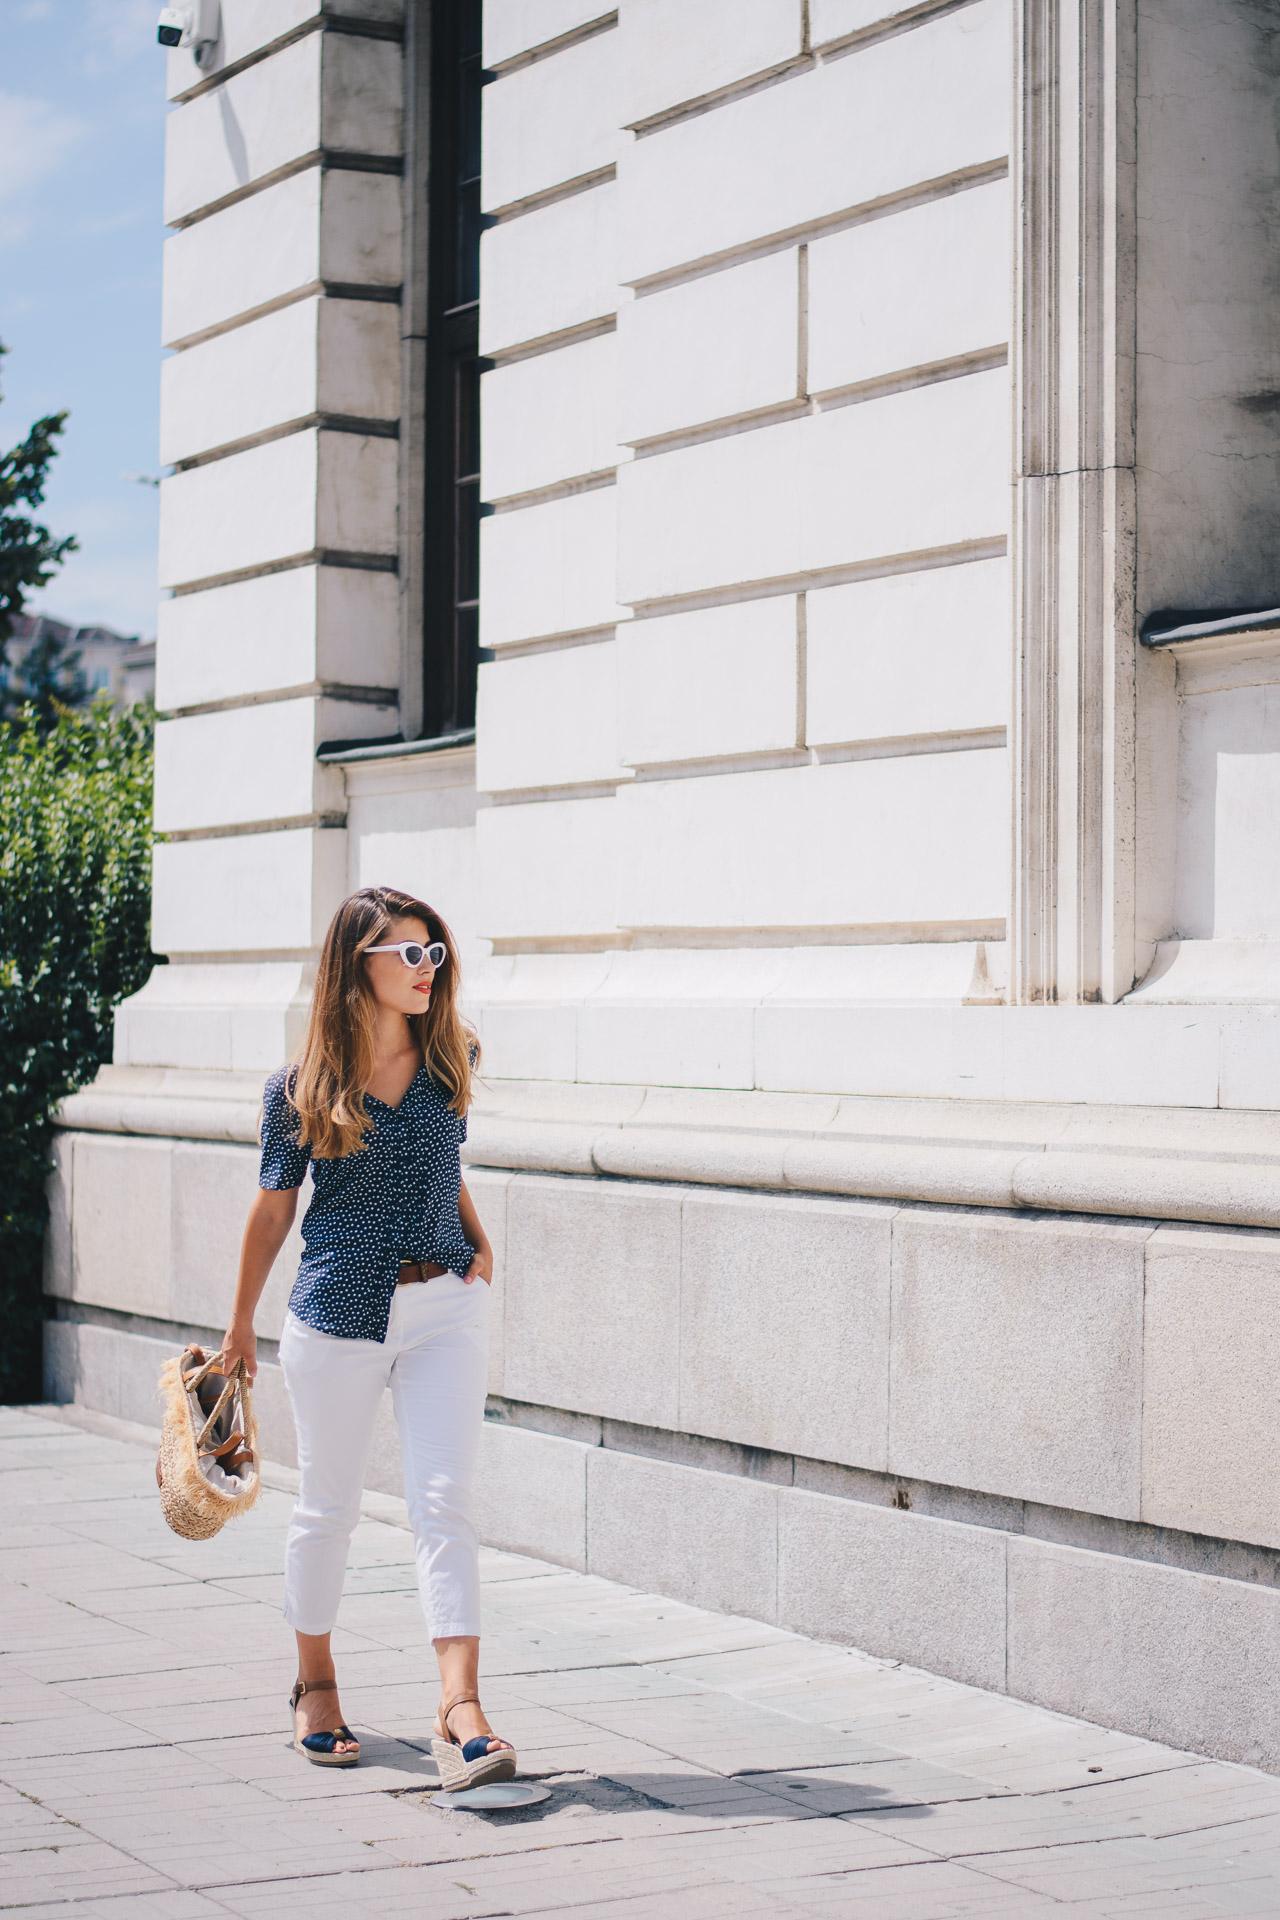 моден блогър риза на точици